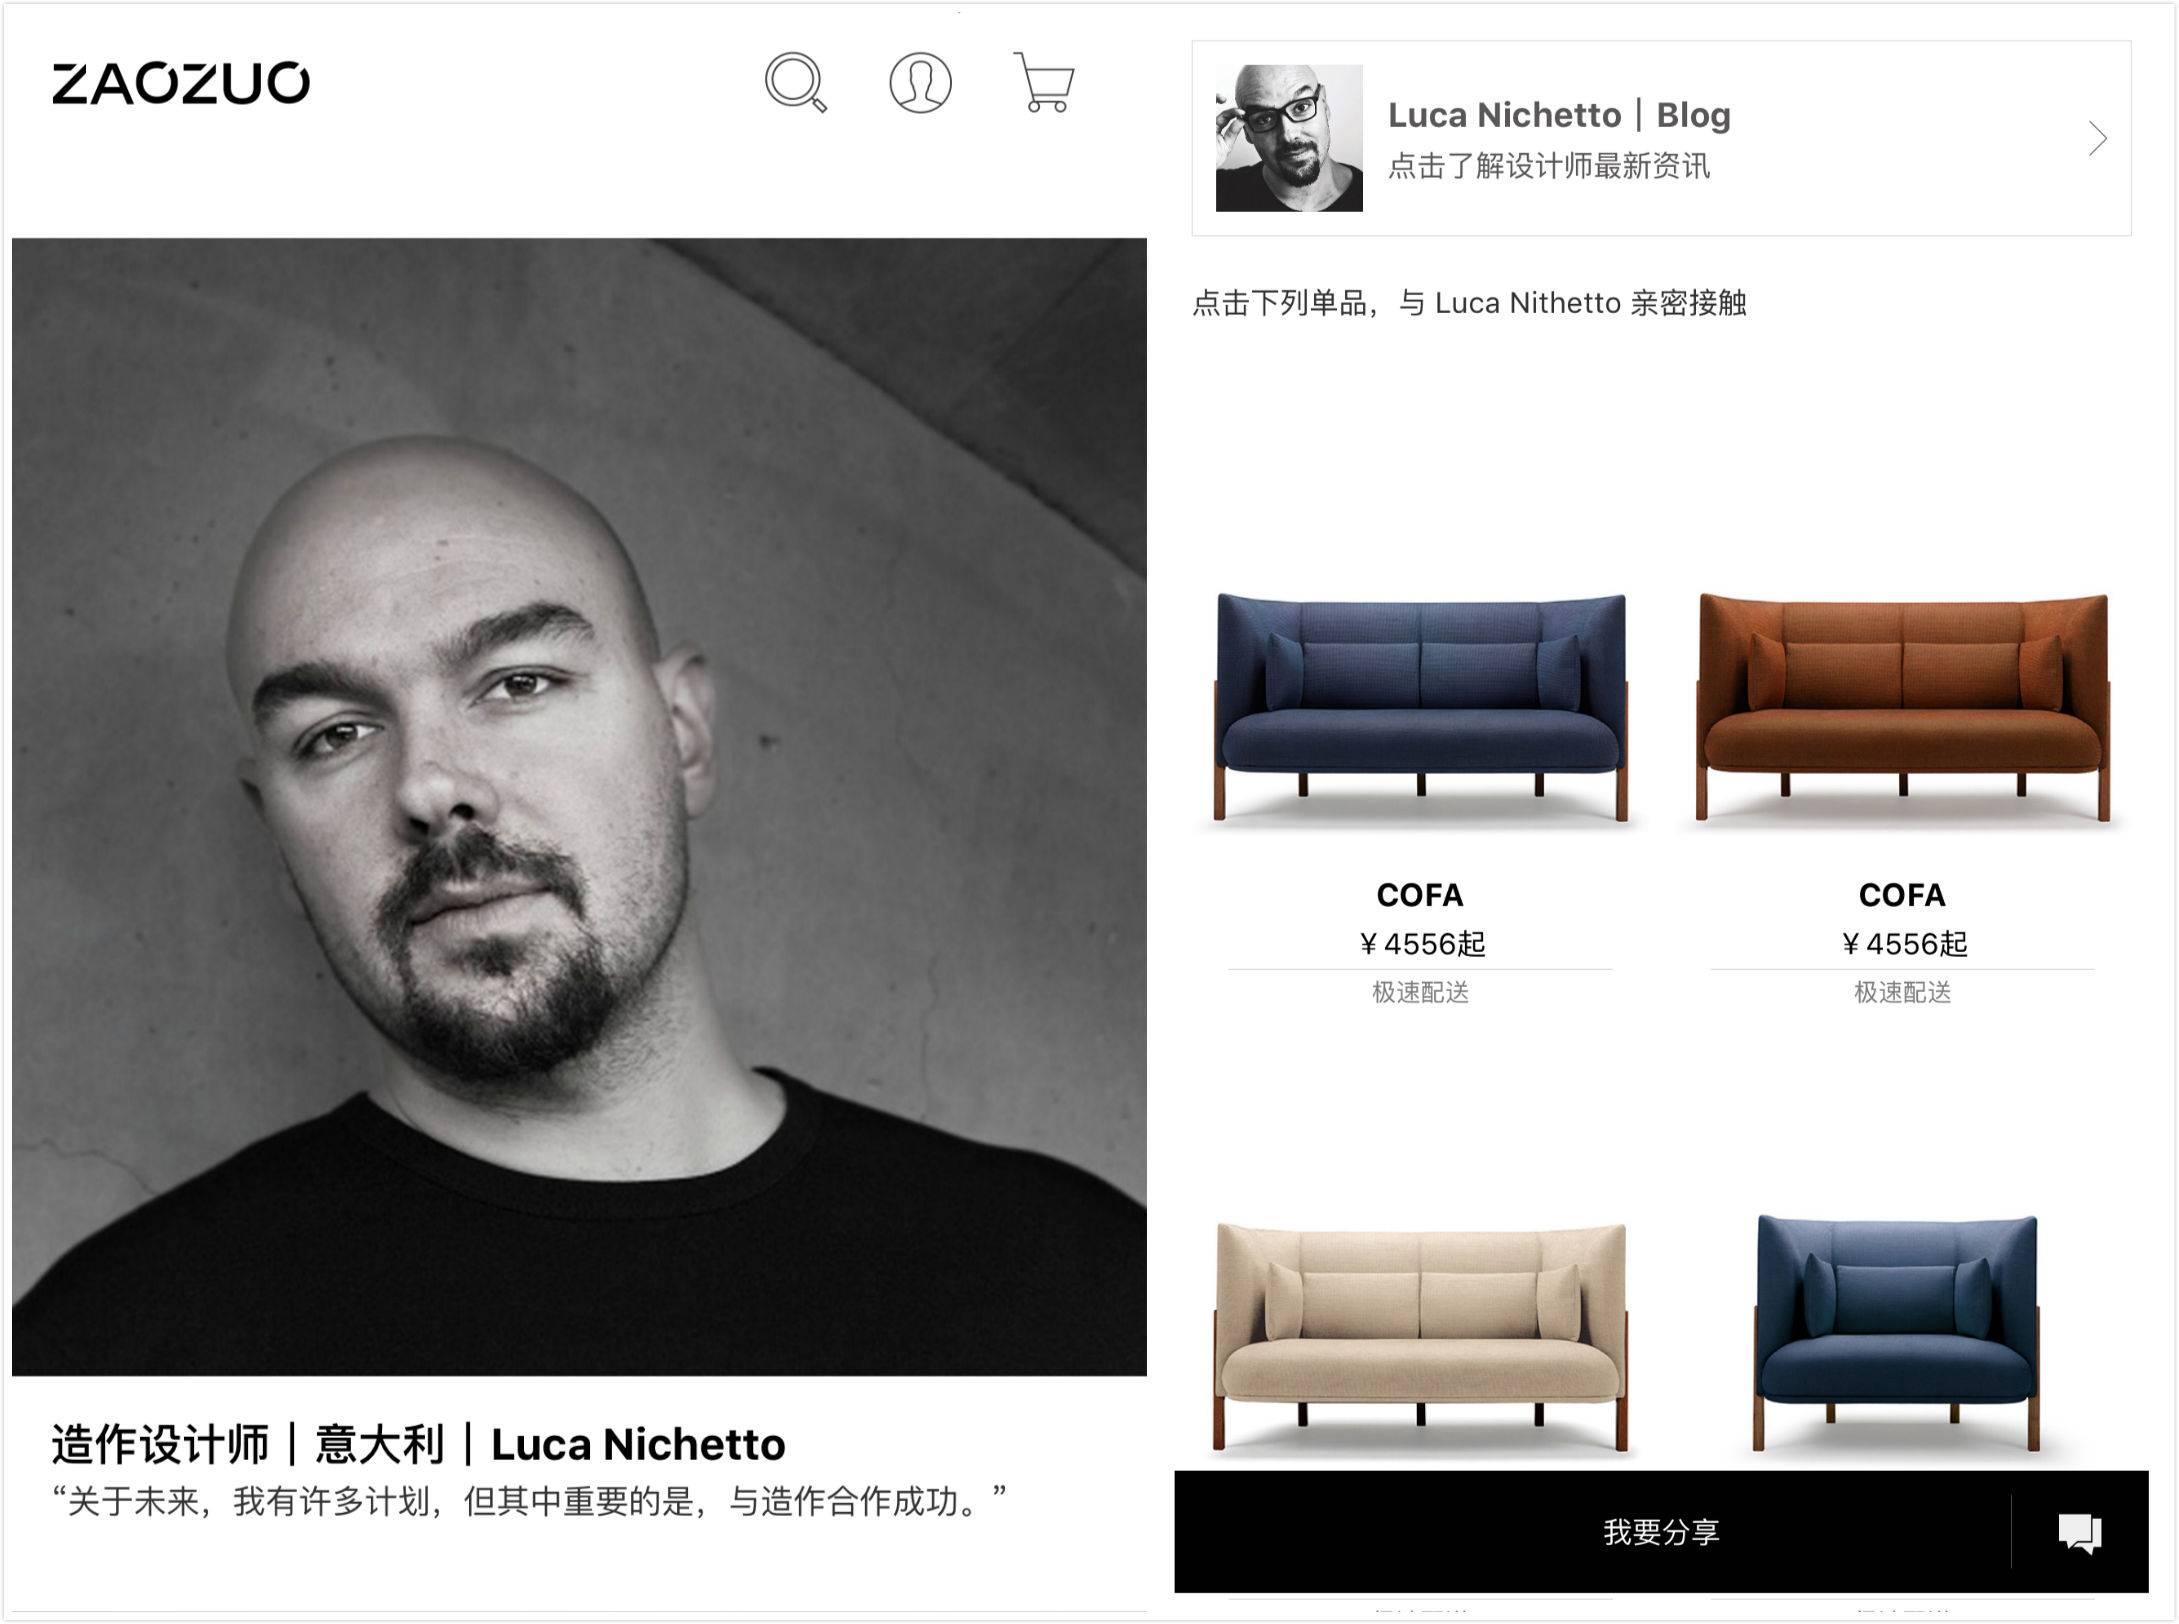 IKEA 已经烂大街?不妨来看看这些「价格亲民」的顶尖设计家具#iOS | 极客公园